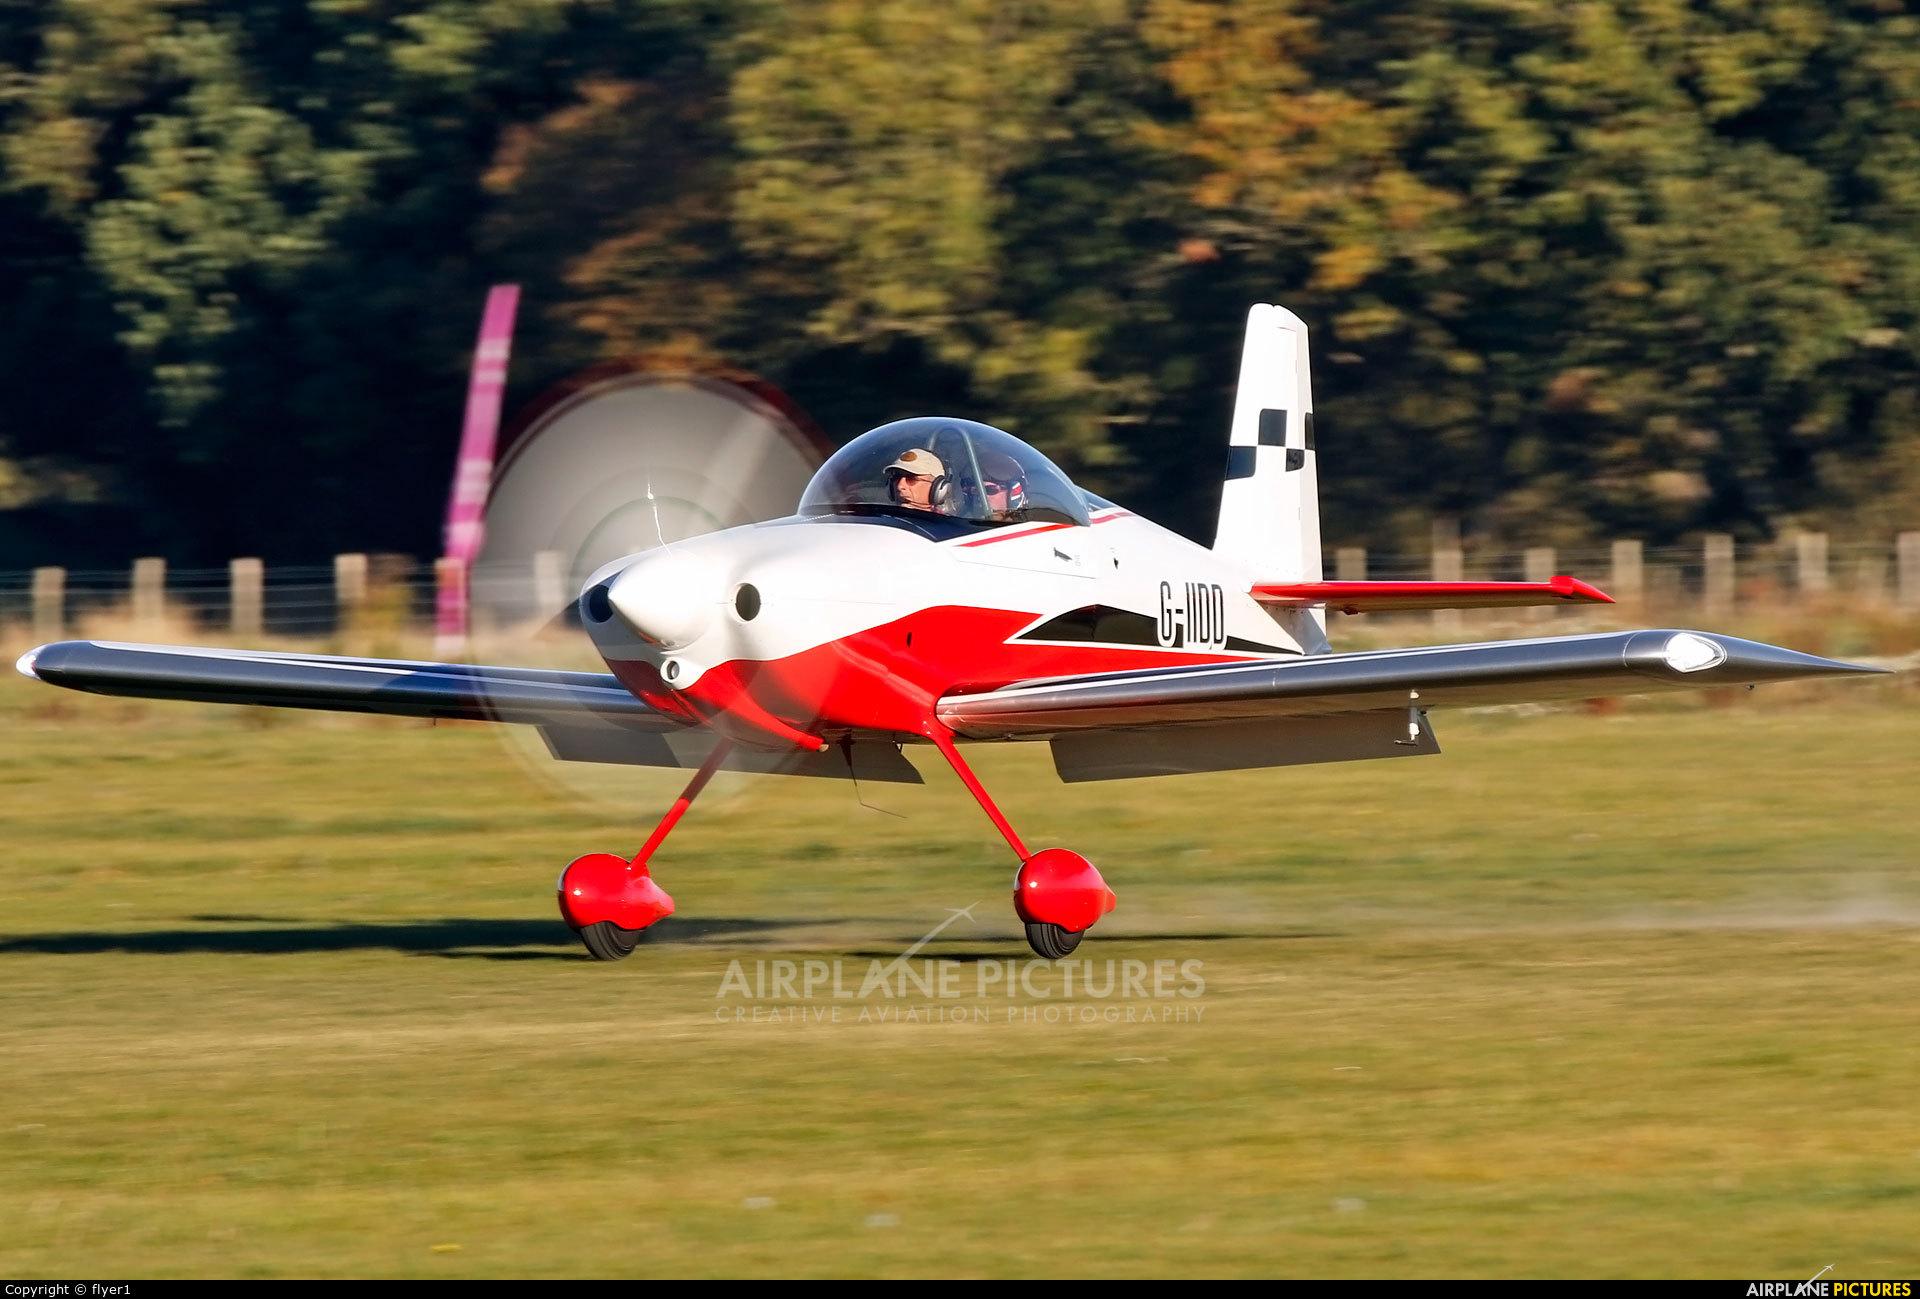 Private G-IIDD aircraft at Lashenden / Headcorn